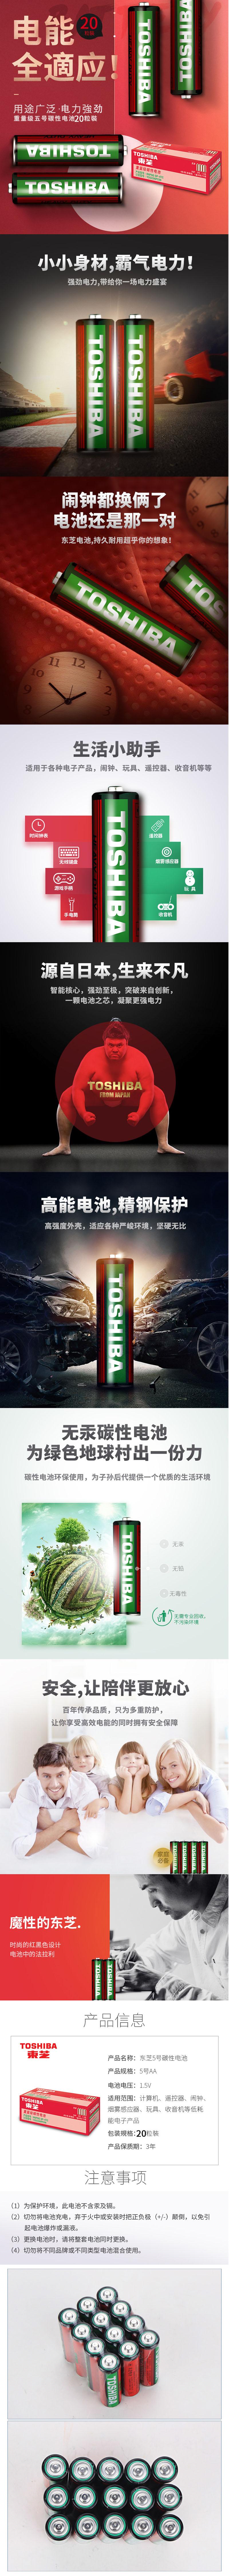 TOSHIBA东芝AA 5号R6P电池碳性一次性干电池铁壳20节装 可混搭7号